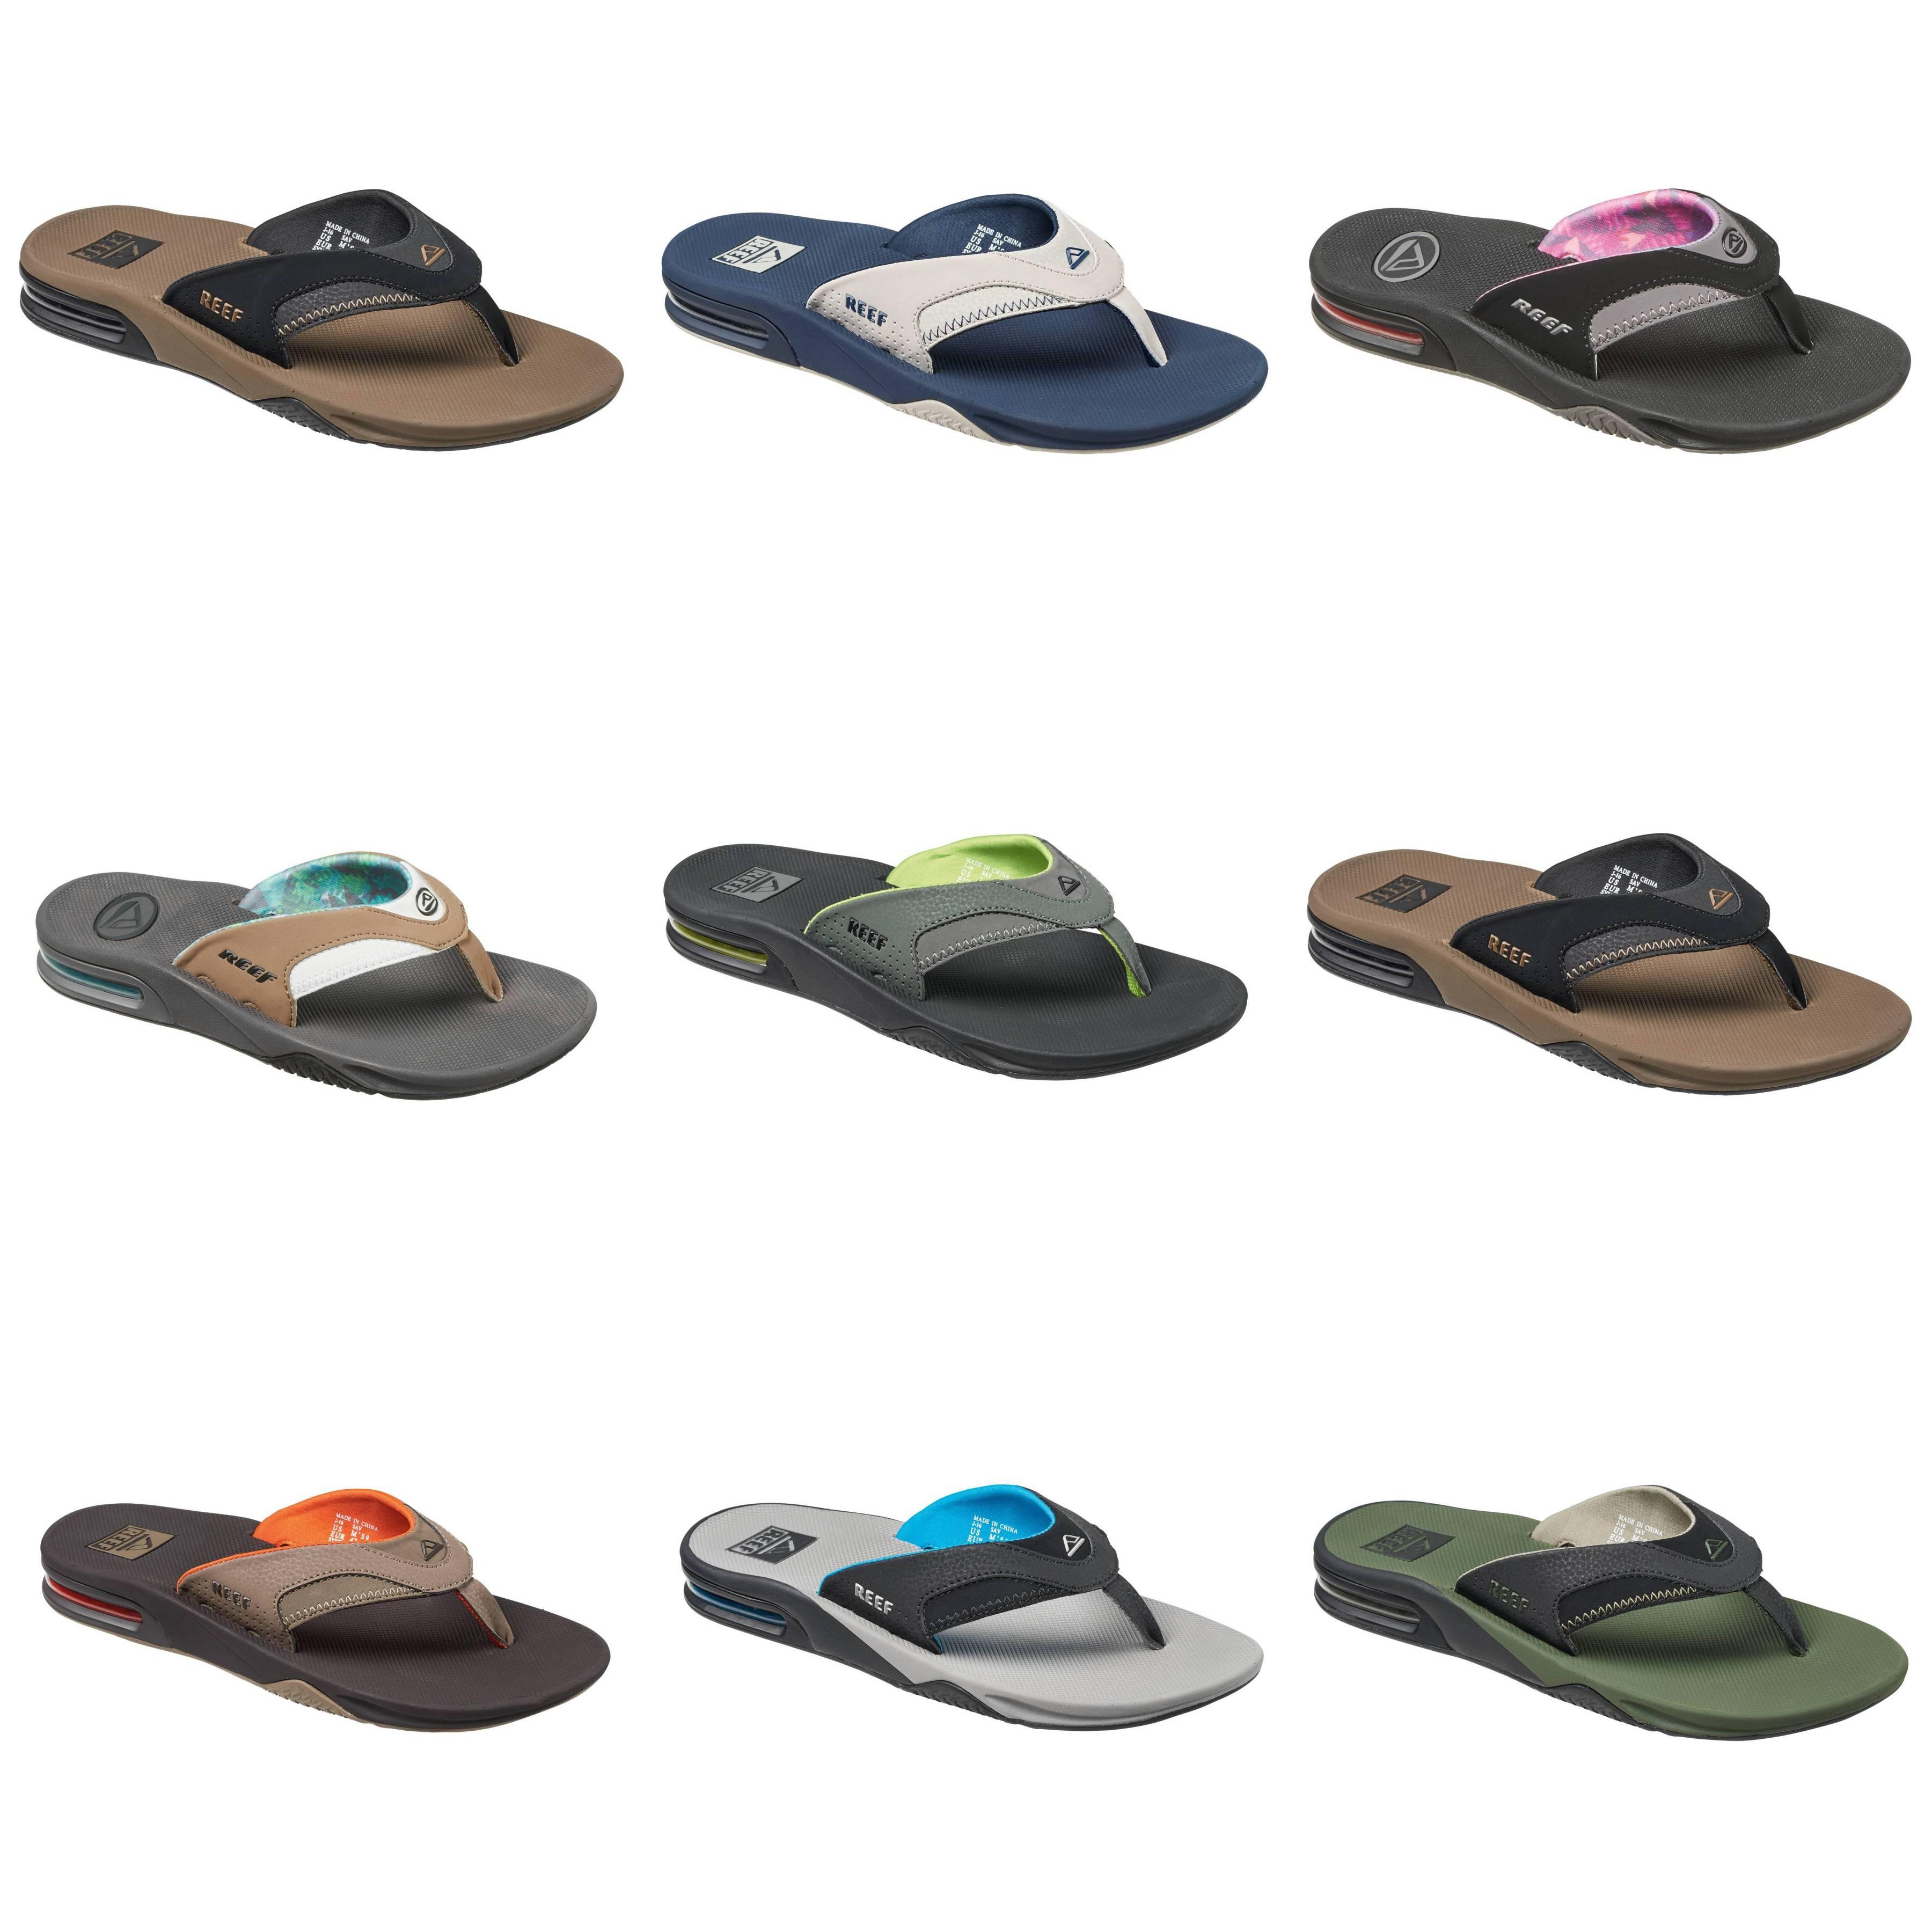 REEF Fanning Zehentrenner Zehenstegsandale Nubuk Gummi Schuhe